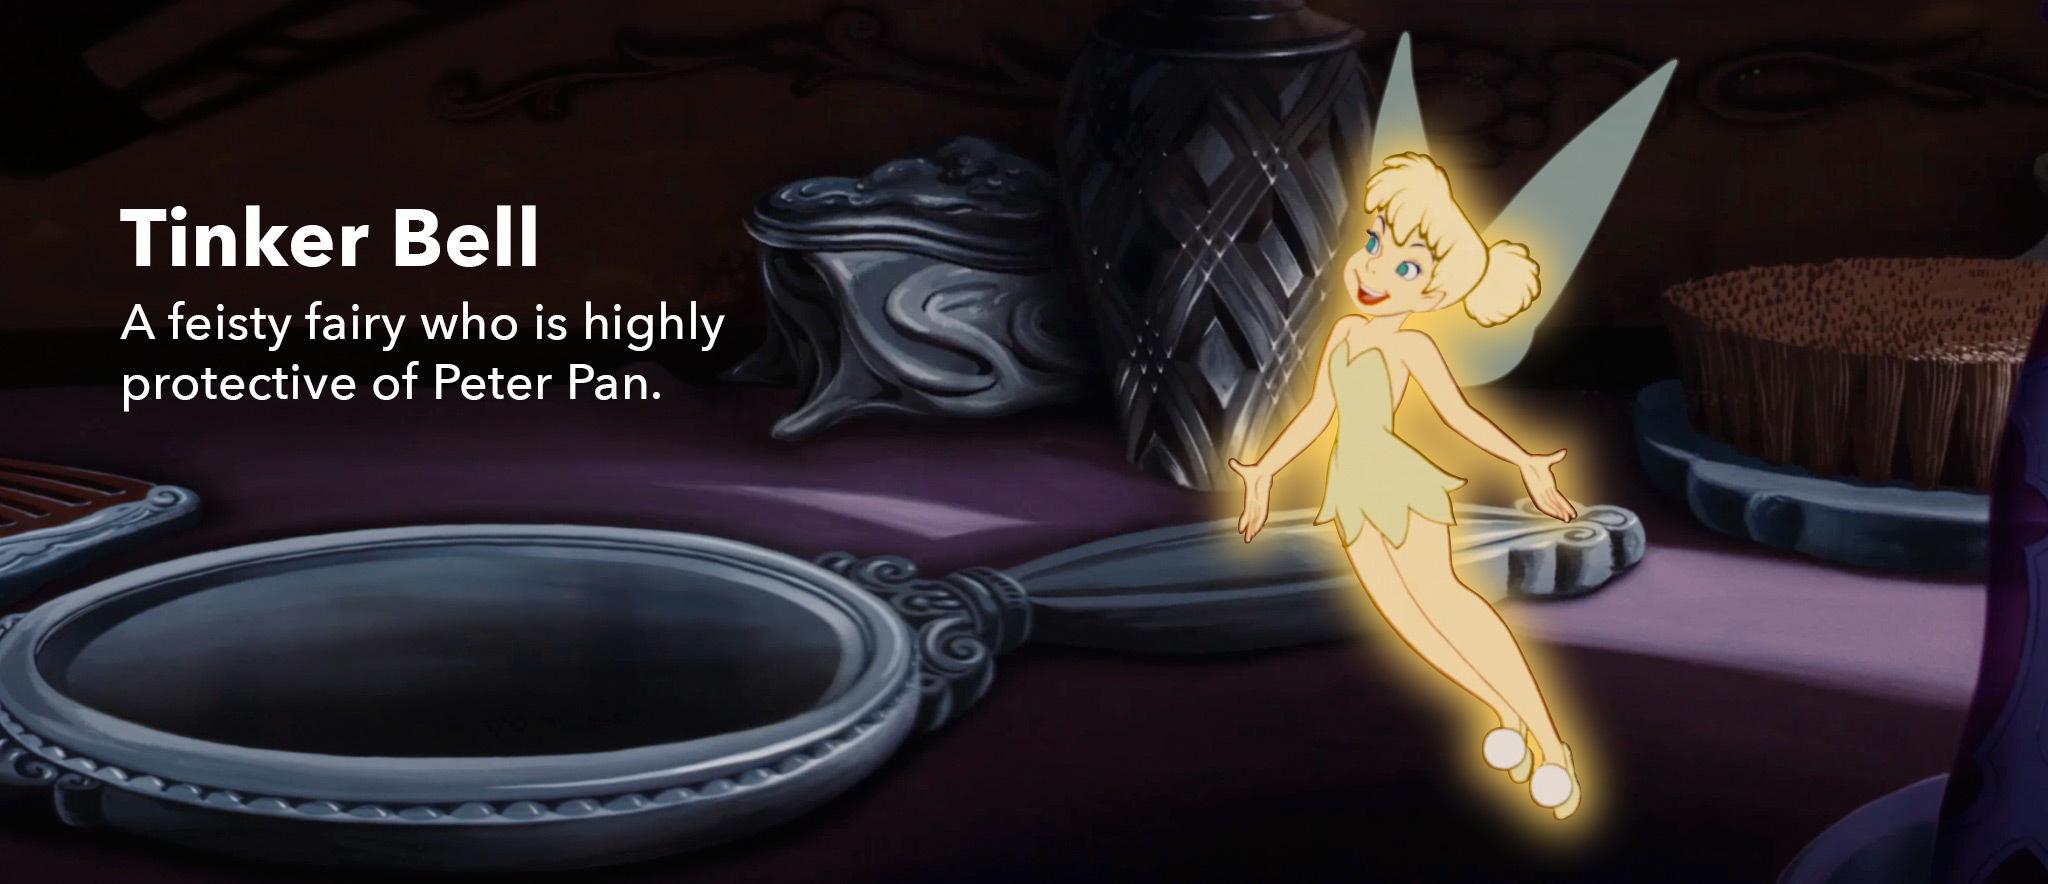 Peter Pan character slider Tink